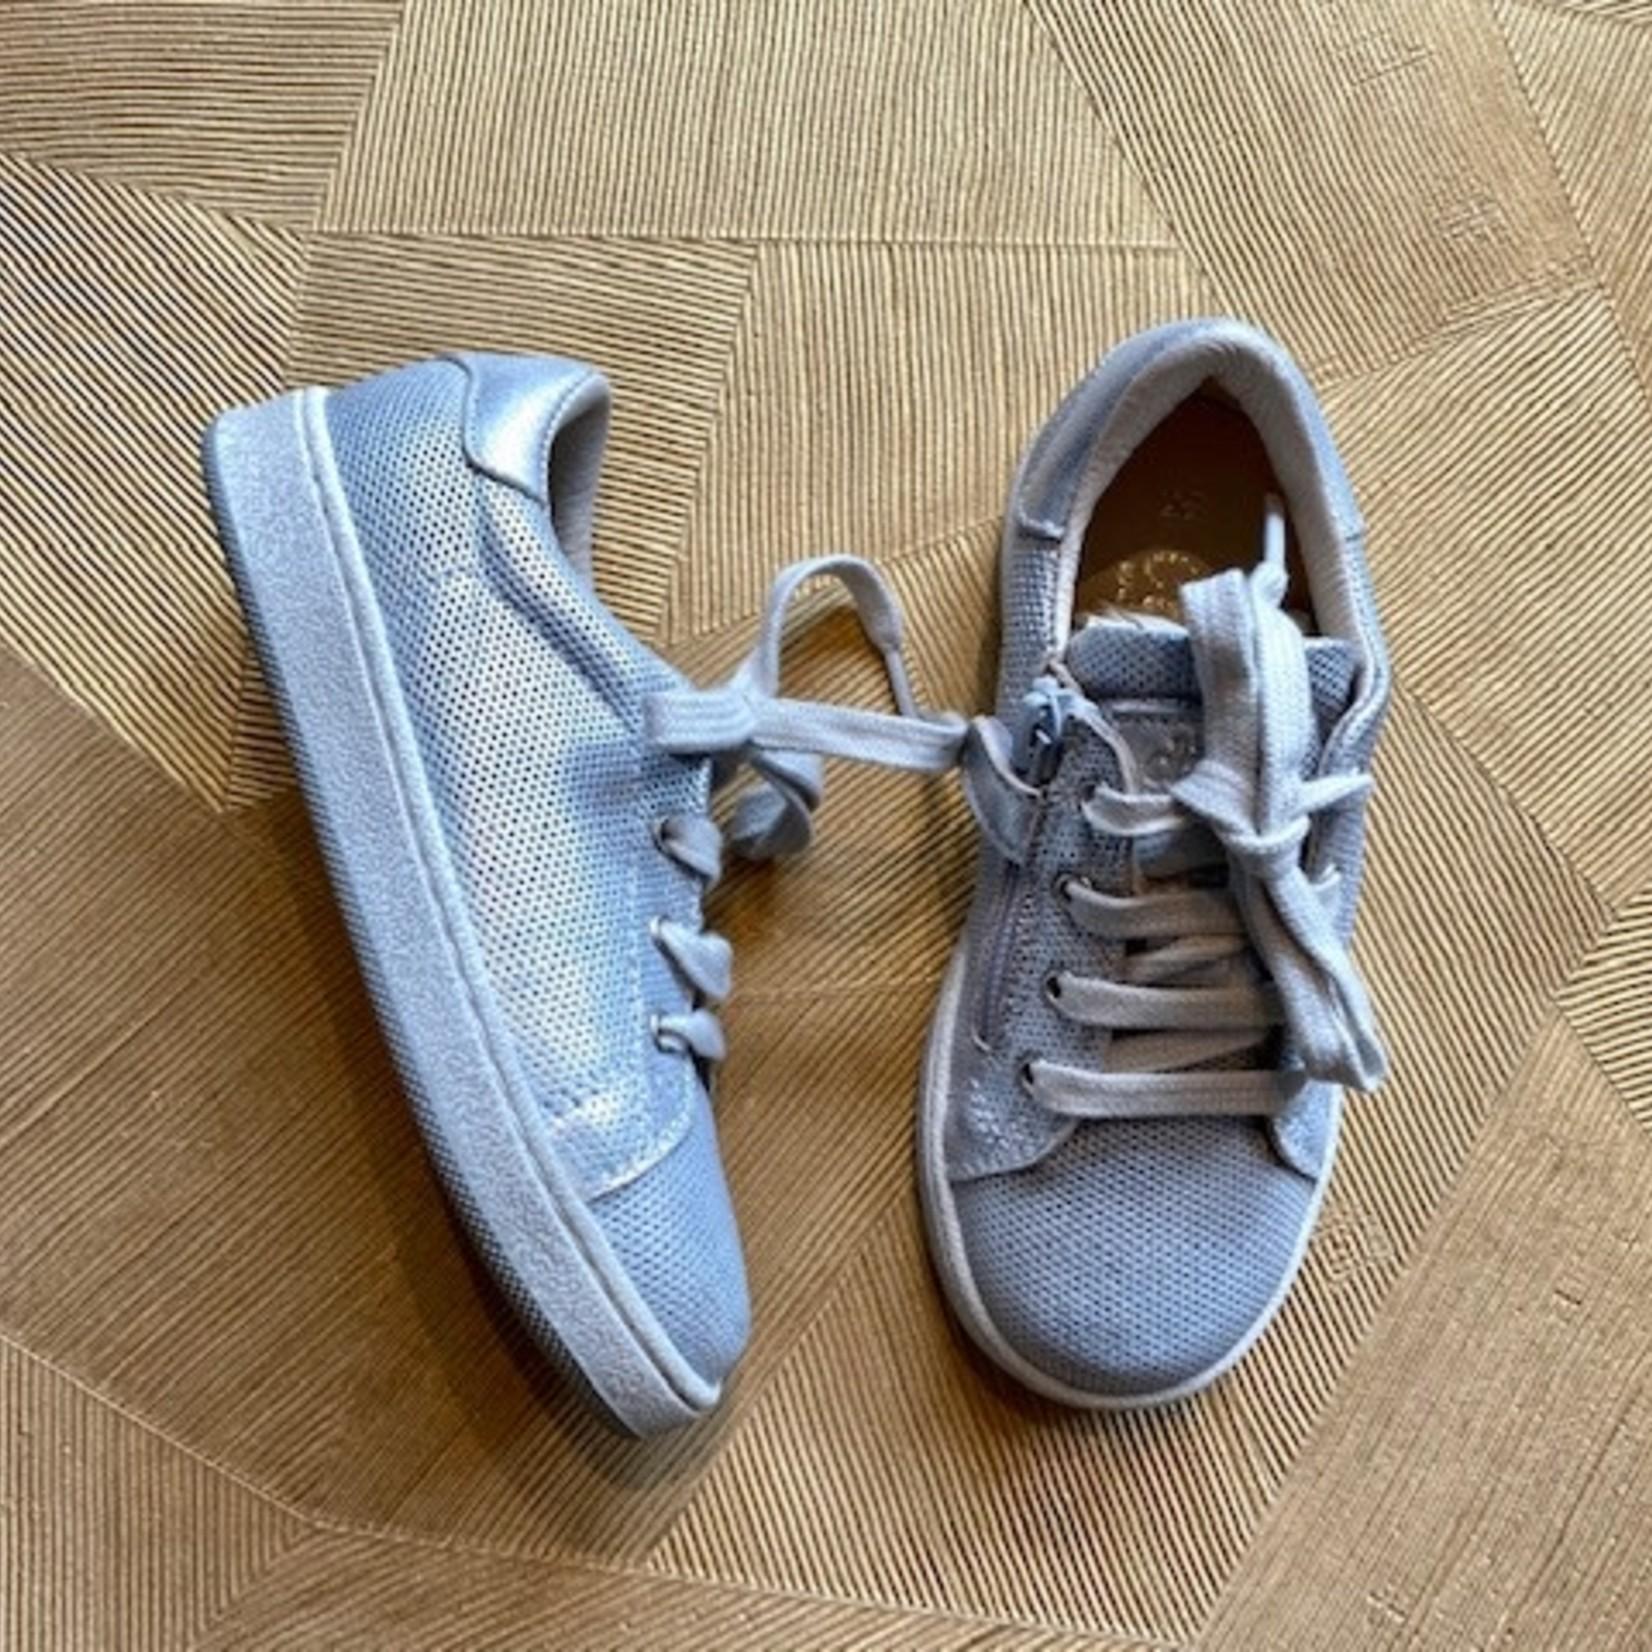 CLIC CLIC sneaker v+r metalic leer.